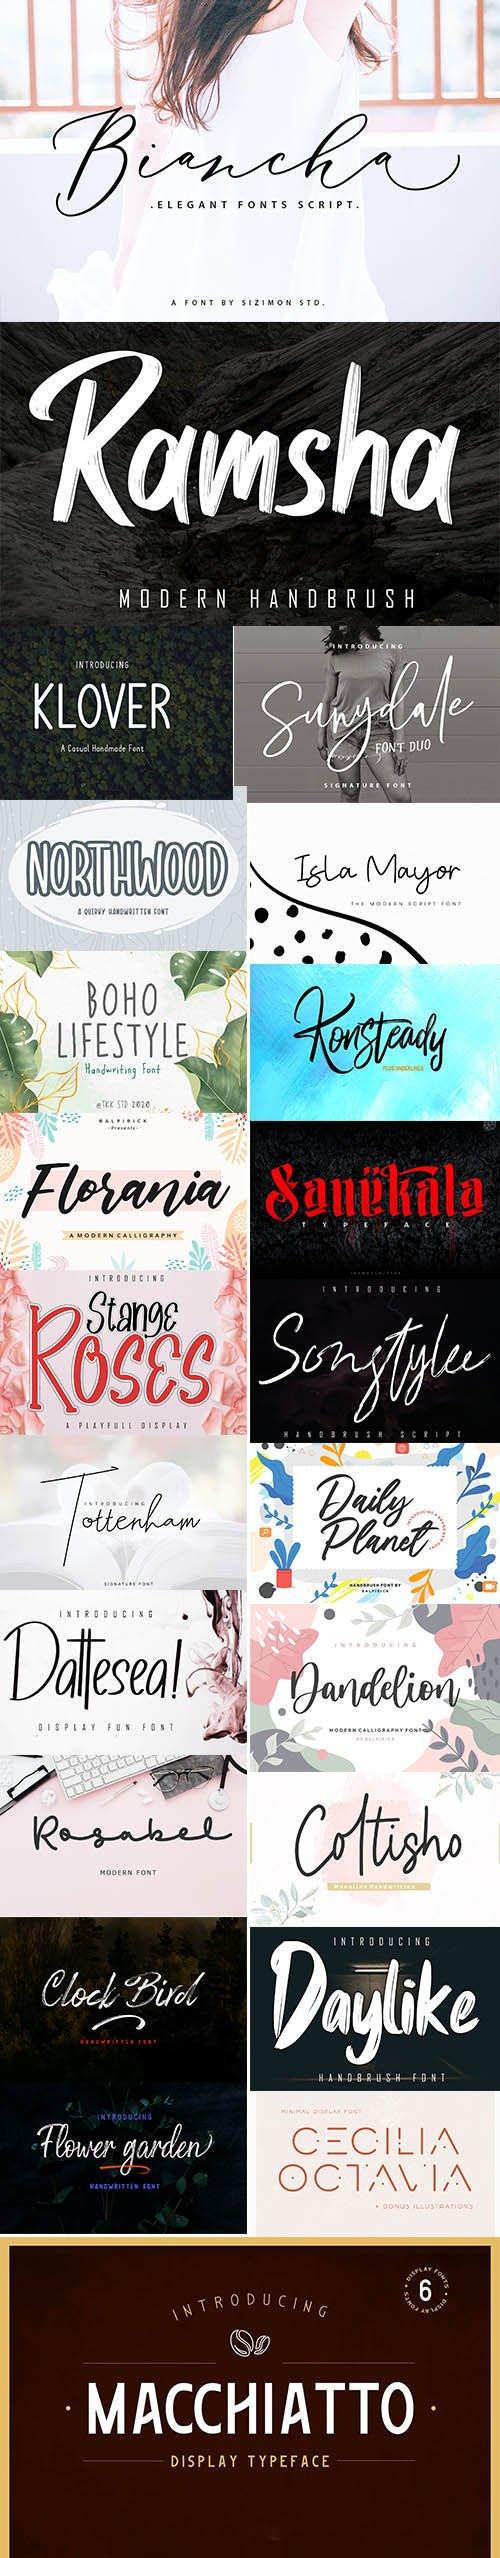 23 Creative Fonts Pack June 2020